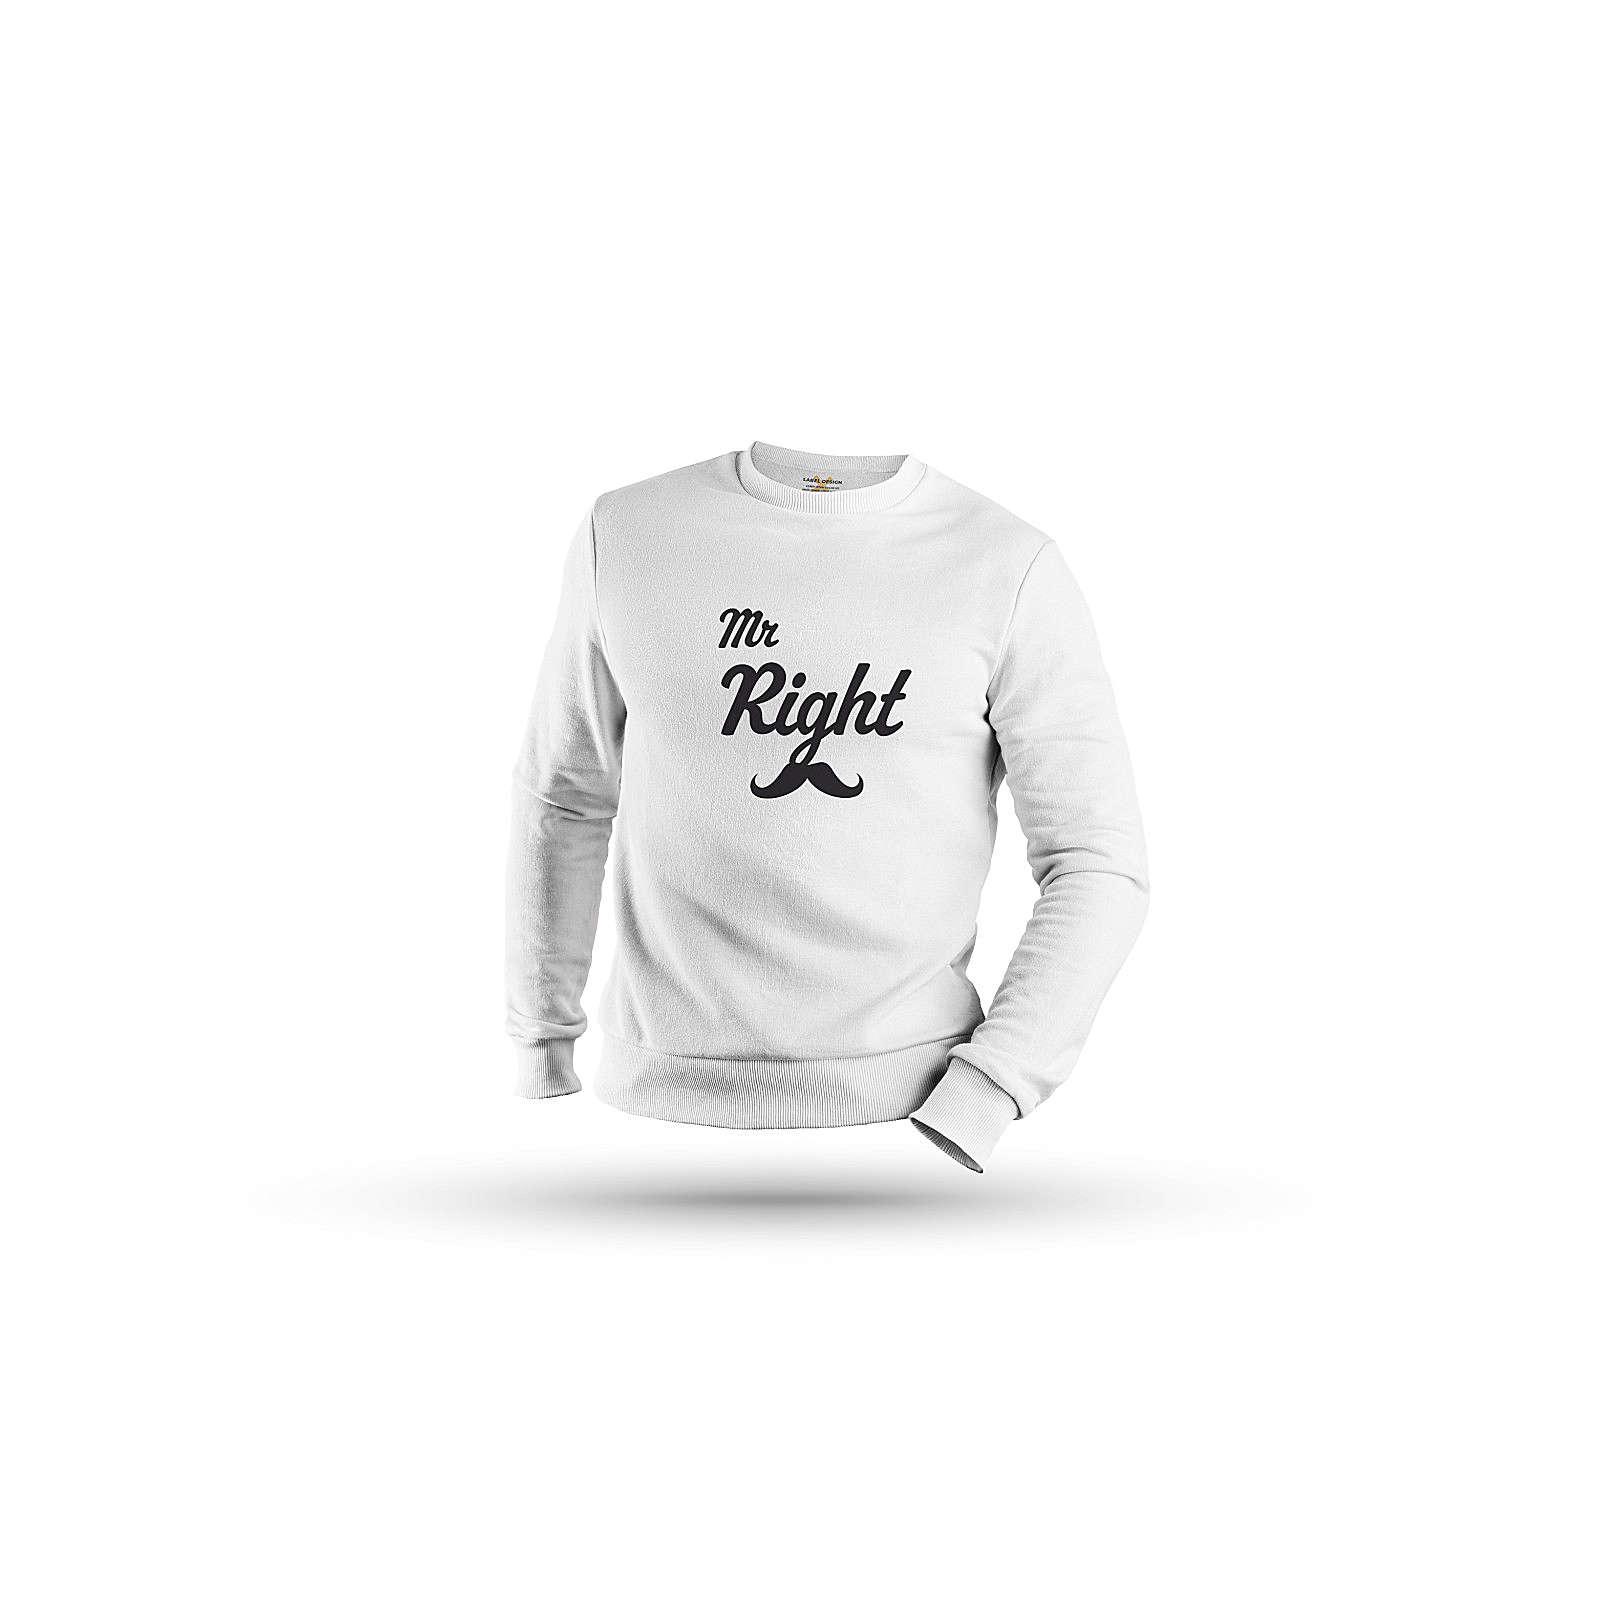 mamino Herren Sweatshirt -Mr right & Ms always right couple Sweatshirts weiß Herren Gr. 52